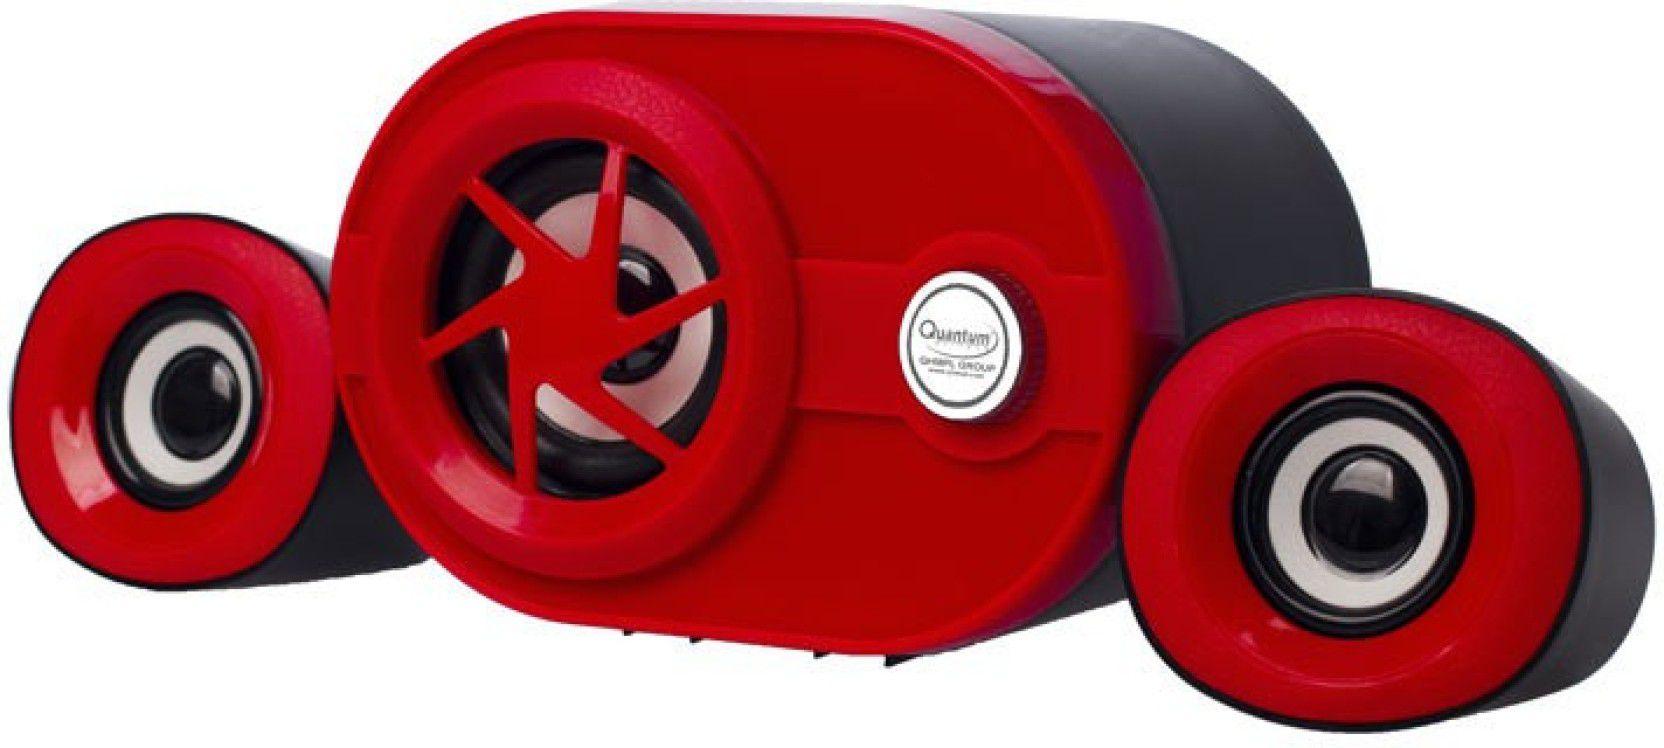 Quantum QHM6200A 2 1 Woofer Multimedia Sound Box Speakers - Red For Laptop,  Desktop, Mobiles, TV, MP3/MP4